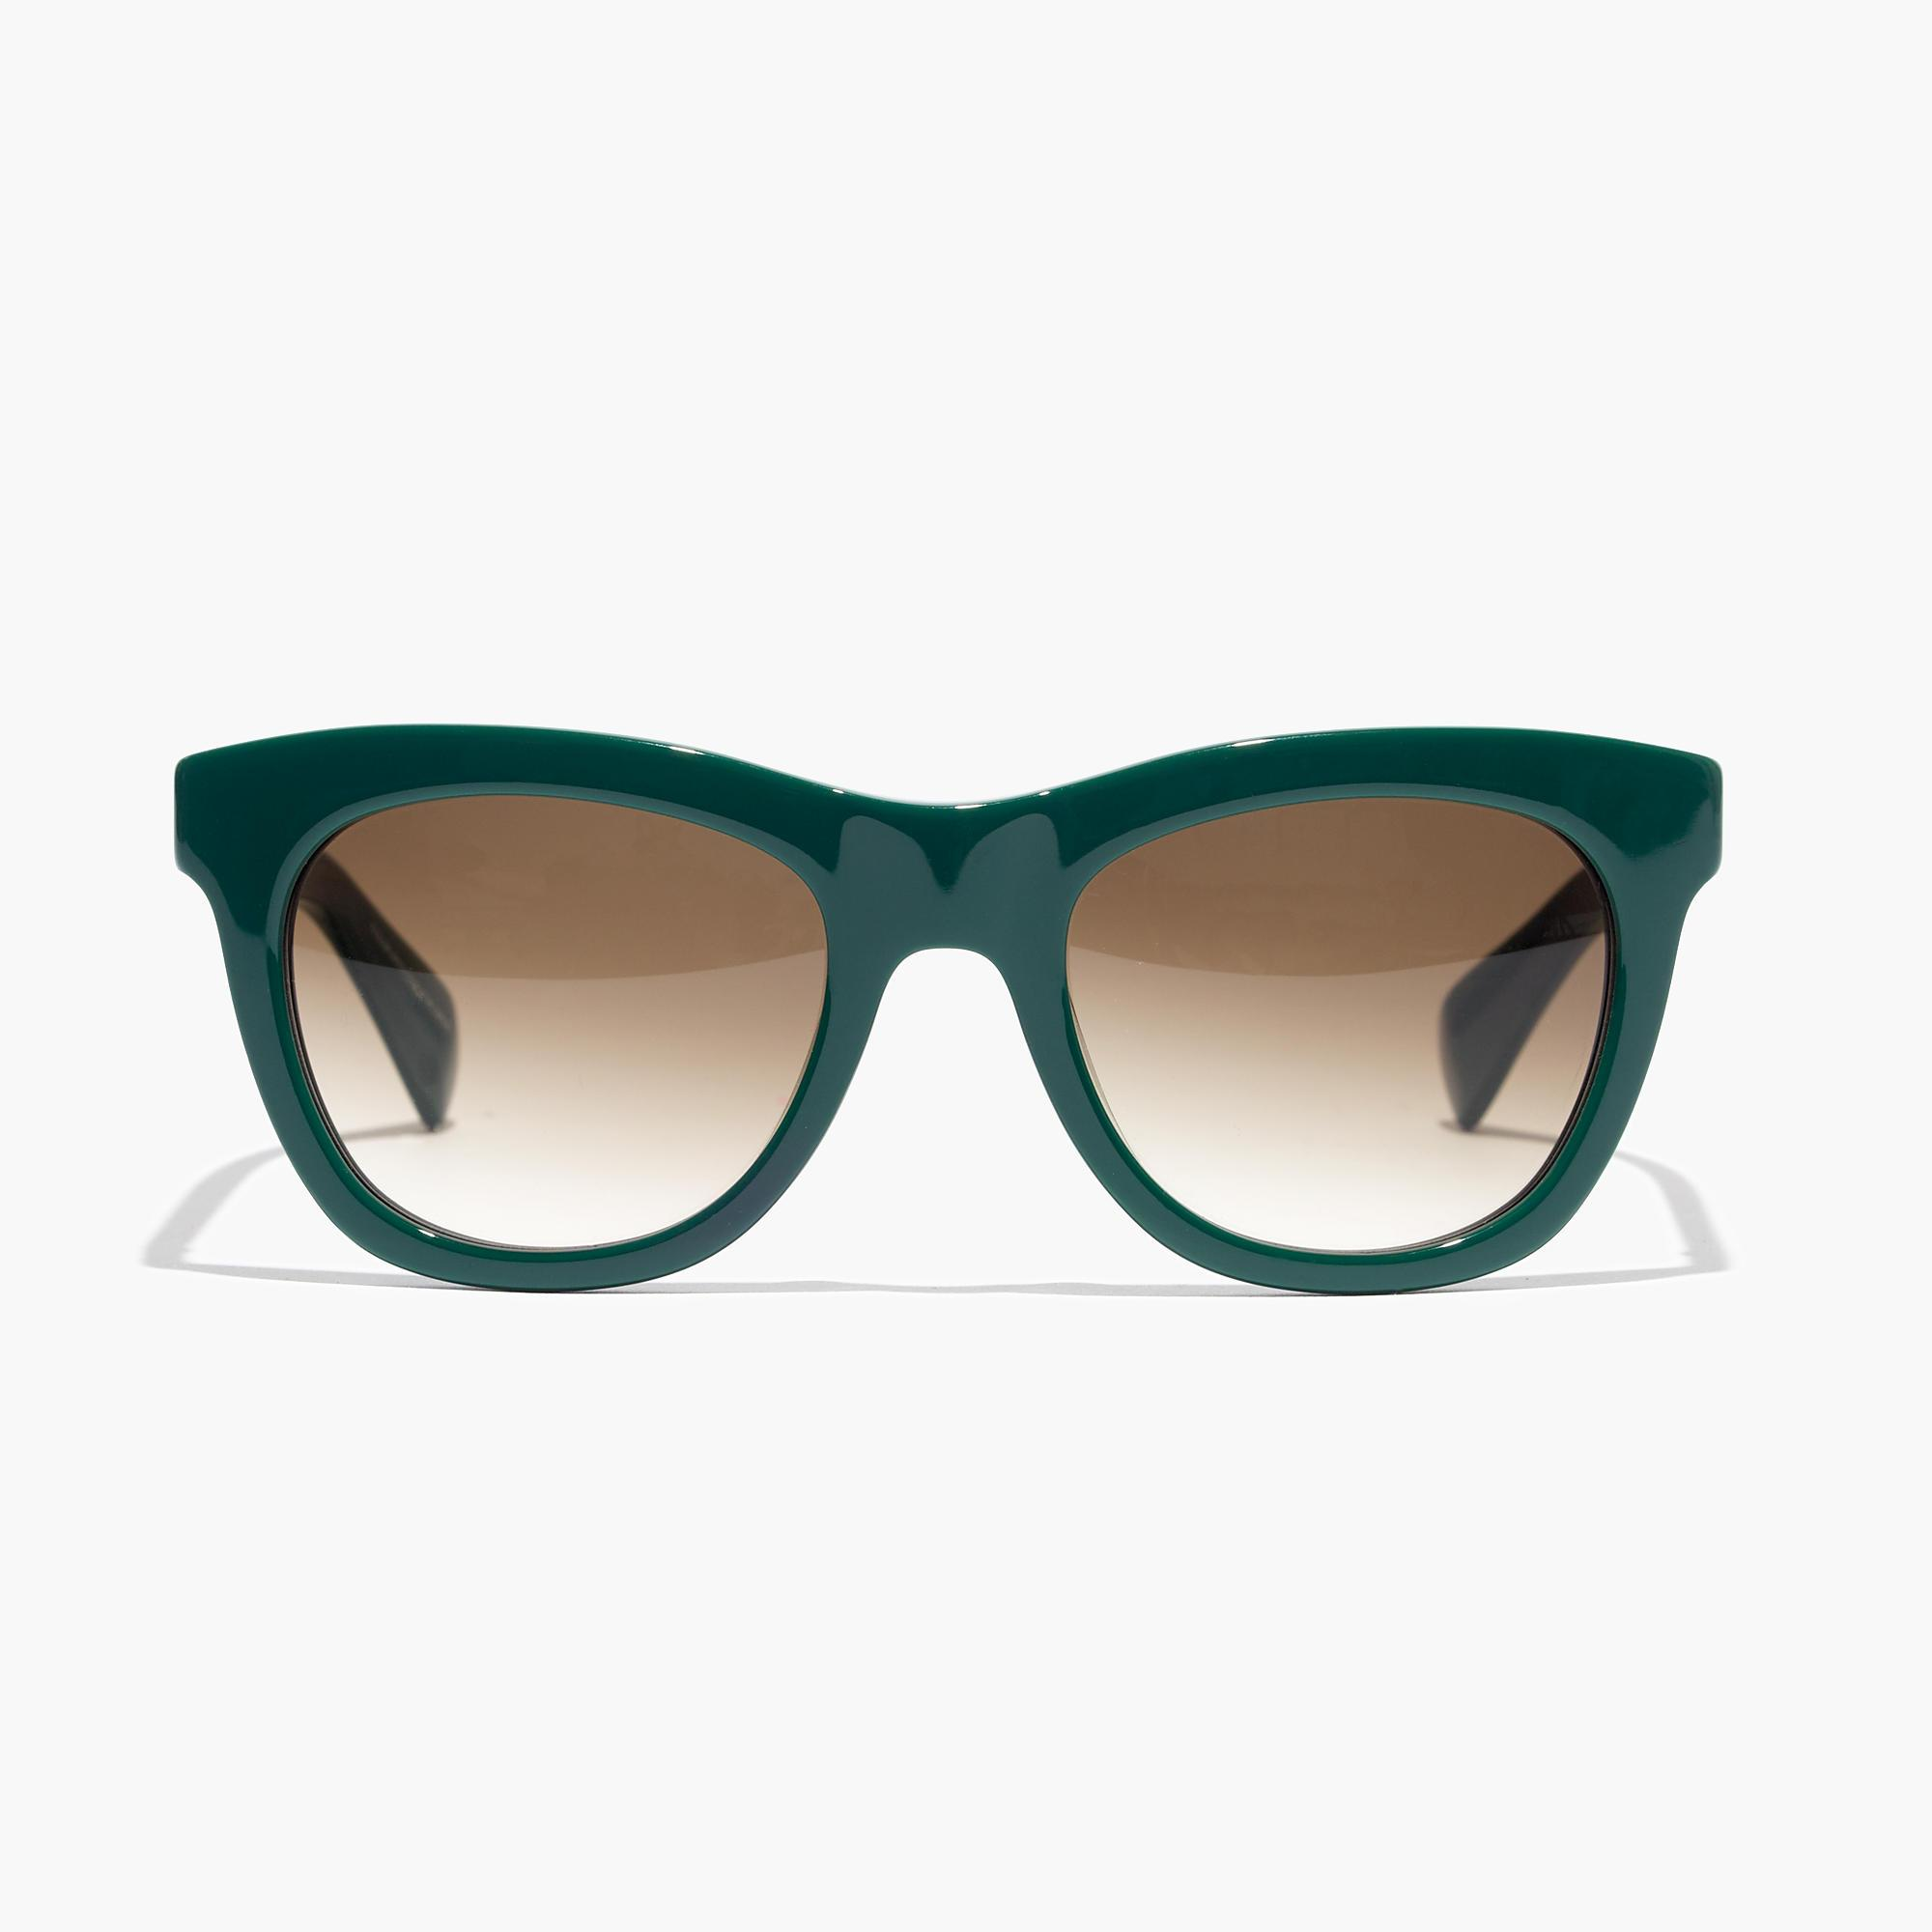 13a7770ec2 J.Crew Betty Sunglasses in Green - Lyst